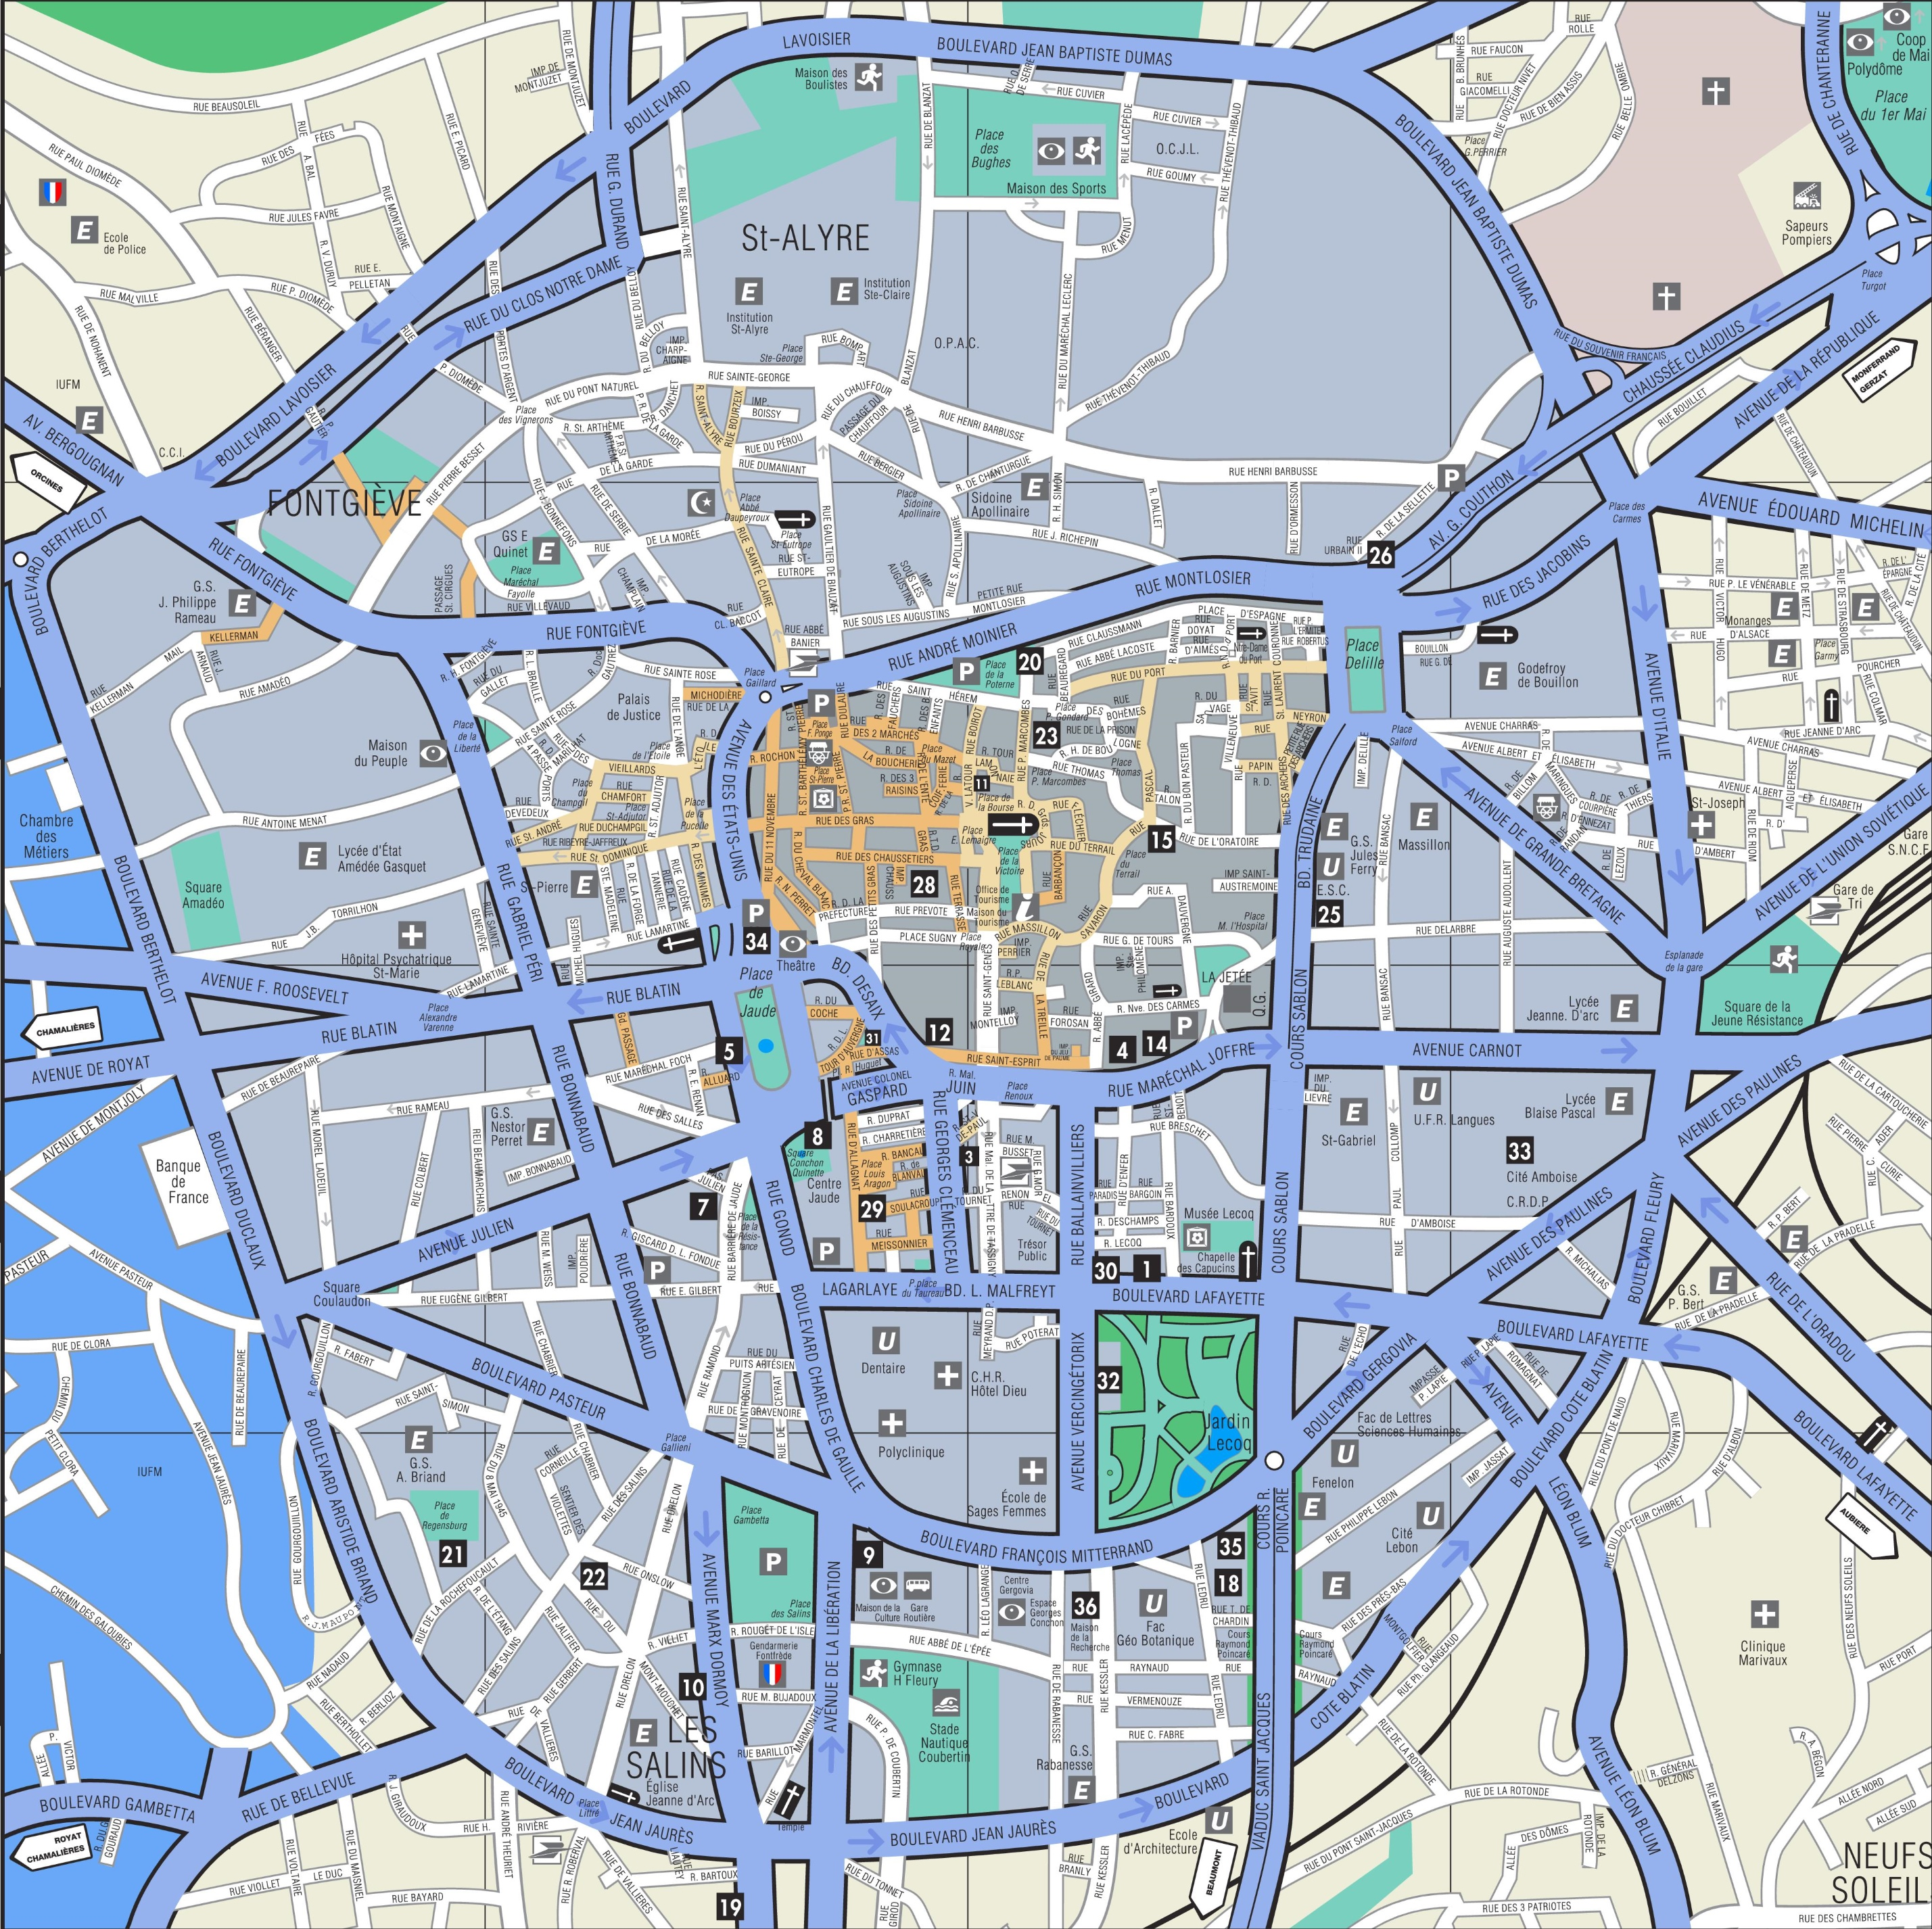 ClermontFerrand city center map